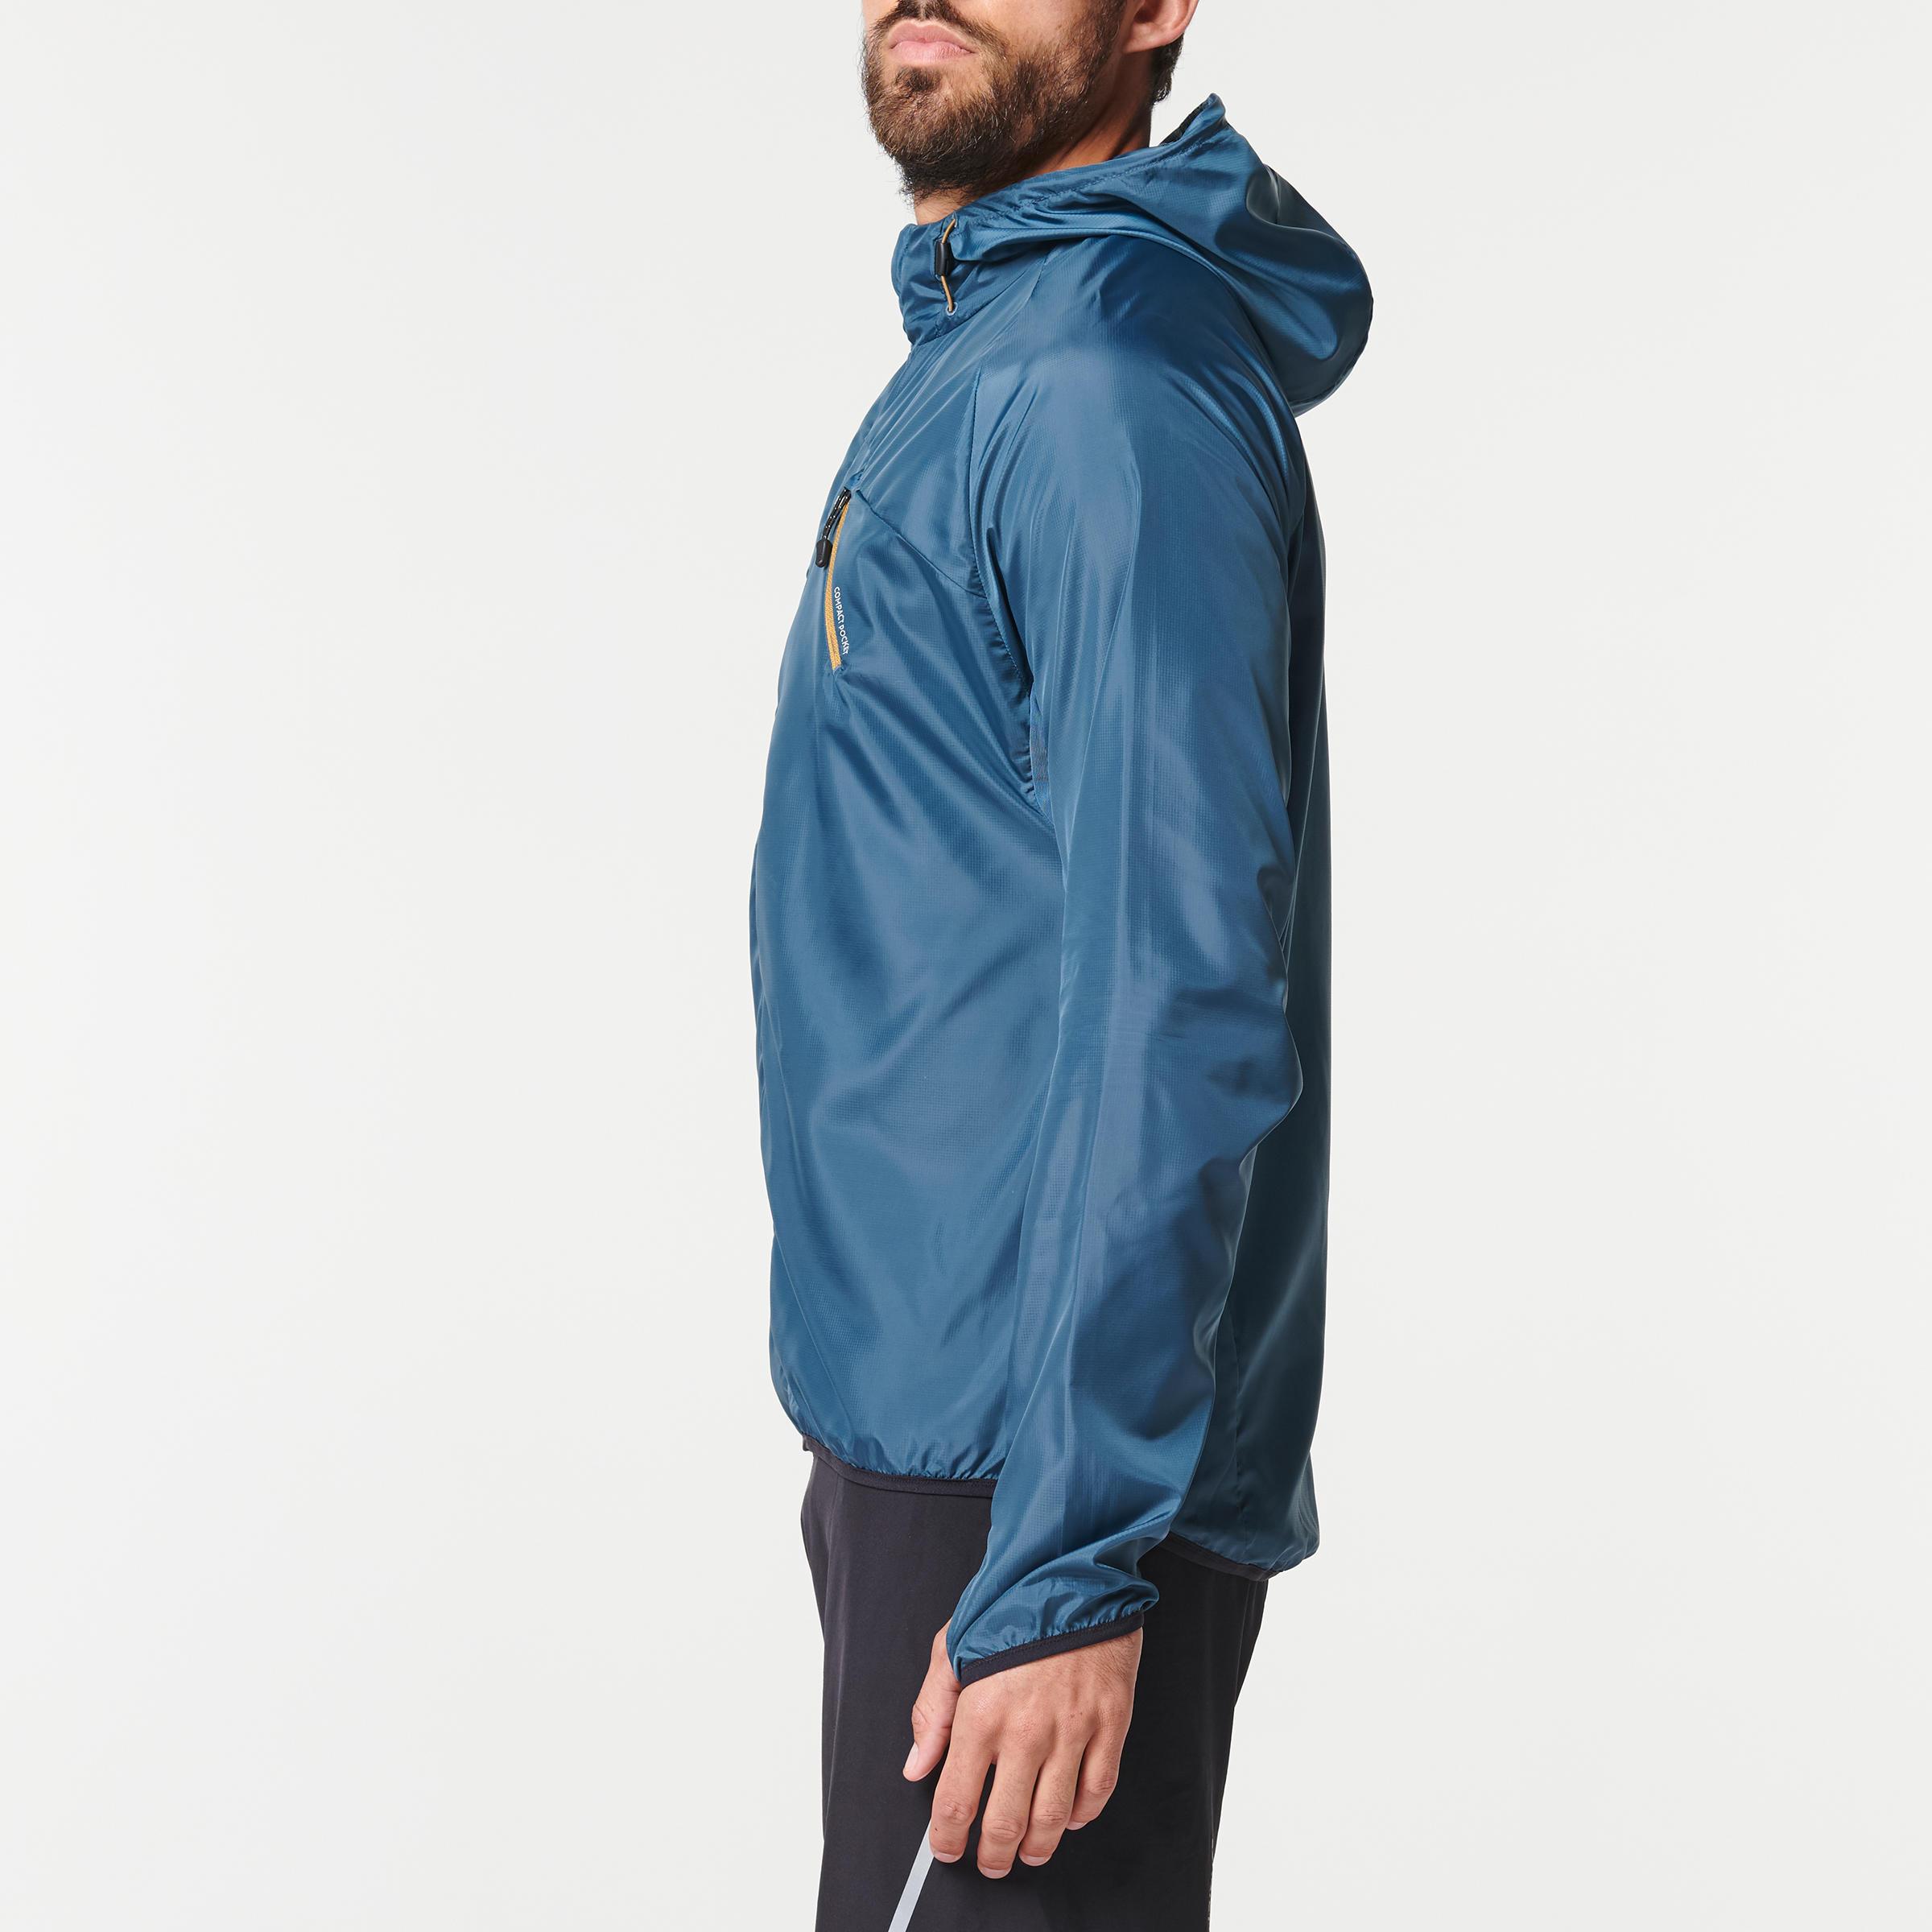 Jachetă Protecție Vânt Bărbați imagine produs